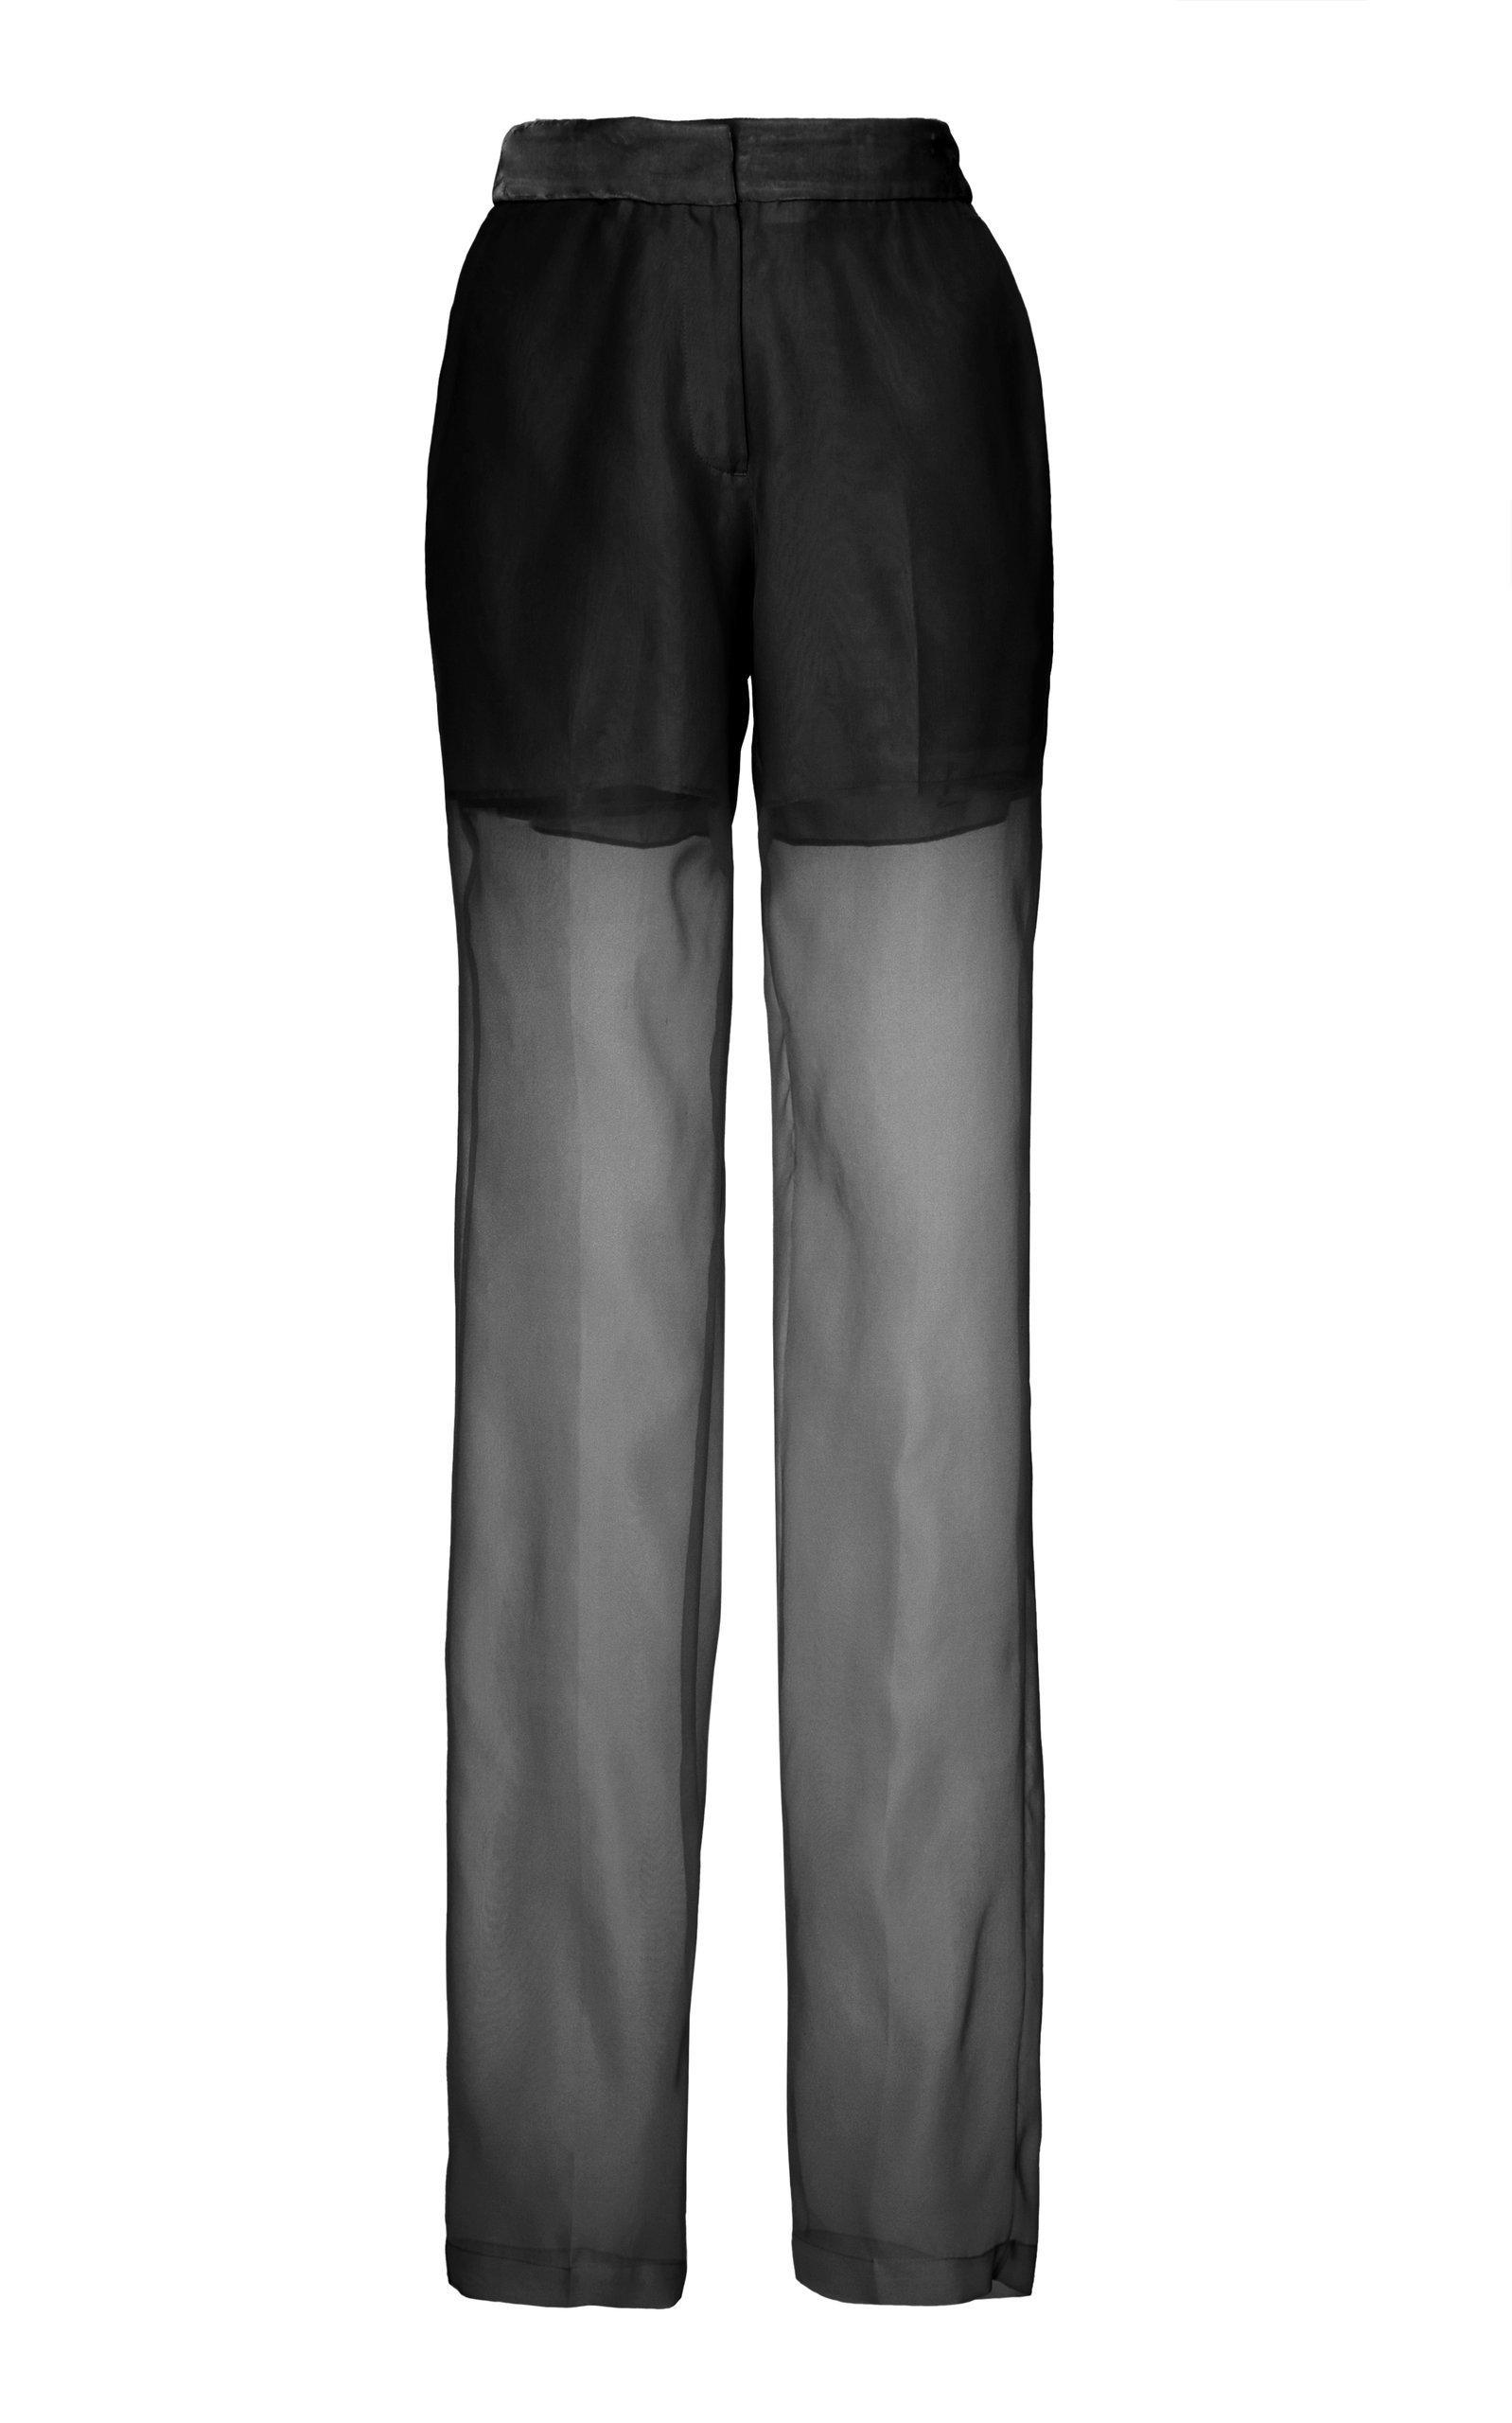 Helmut Lang Sheer Pleated Silk Trousers